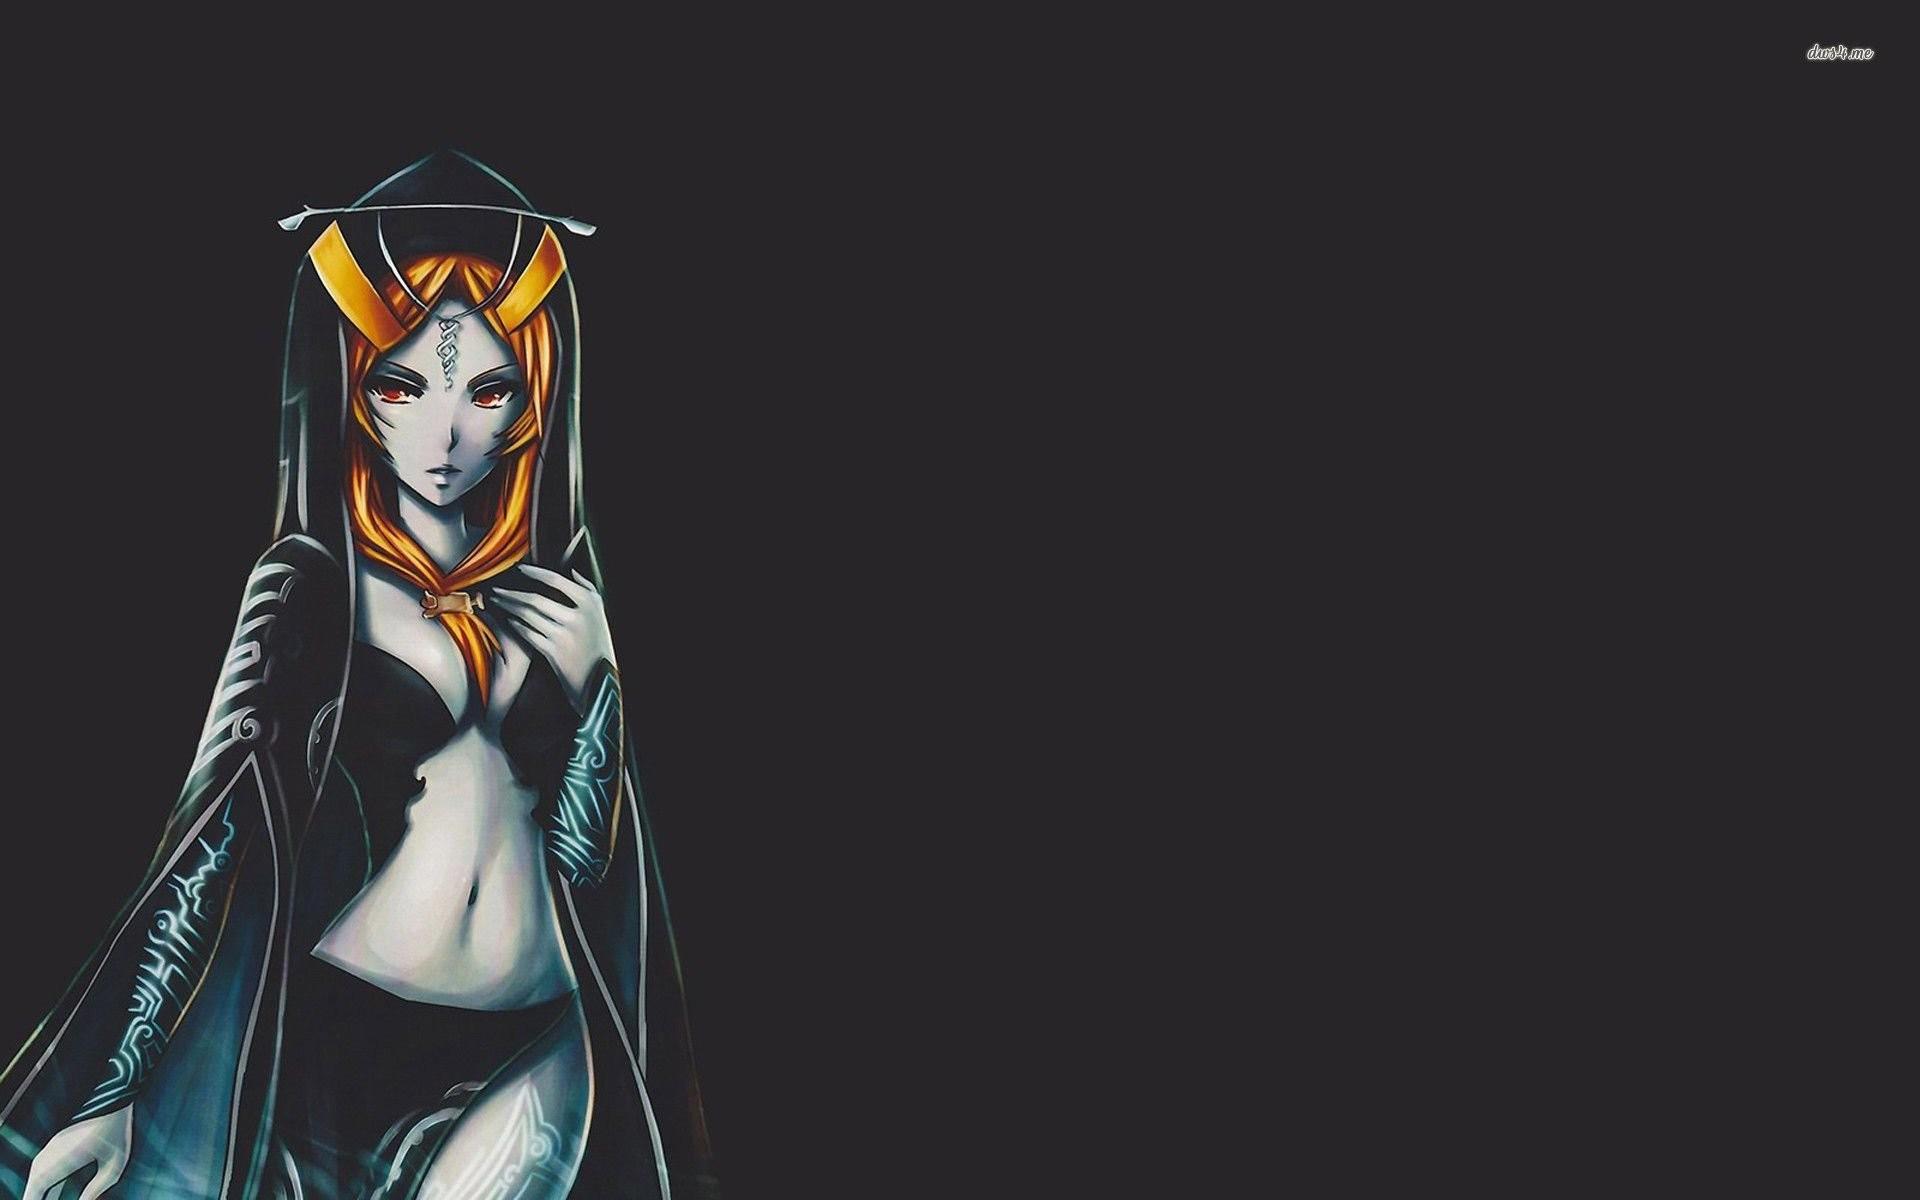 Zelda Wallpaper and Screensavers 65 images